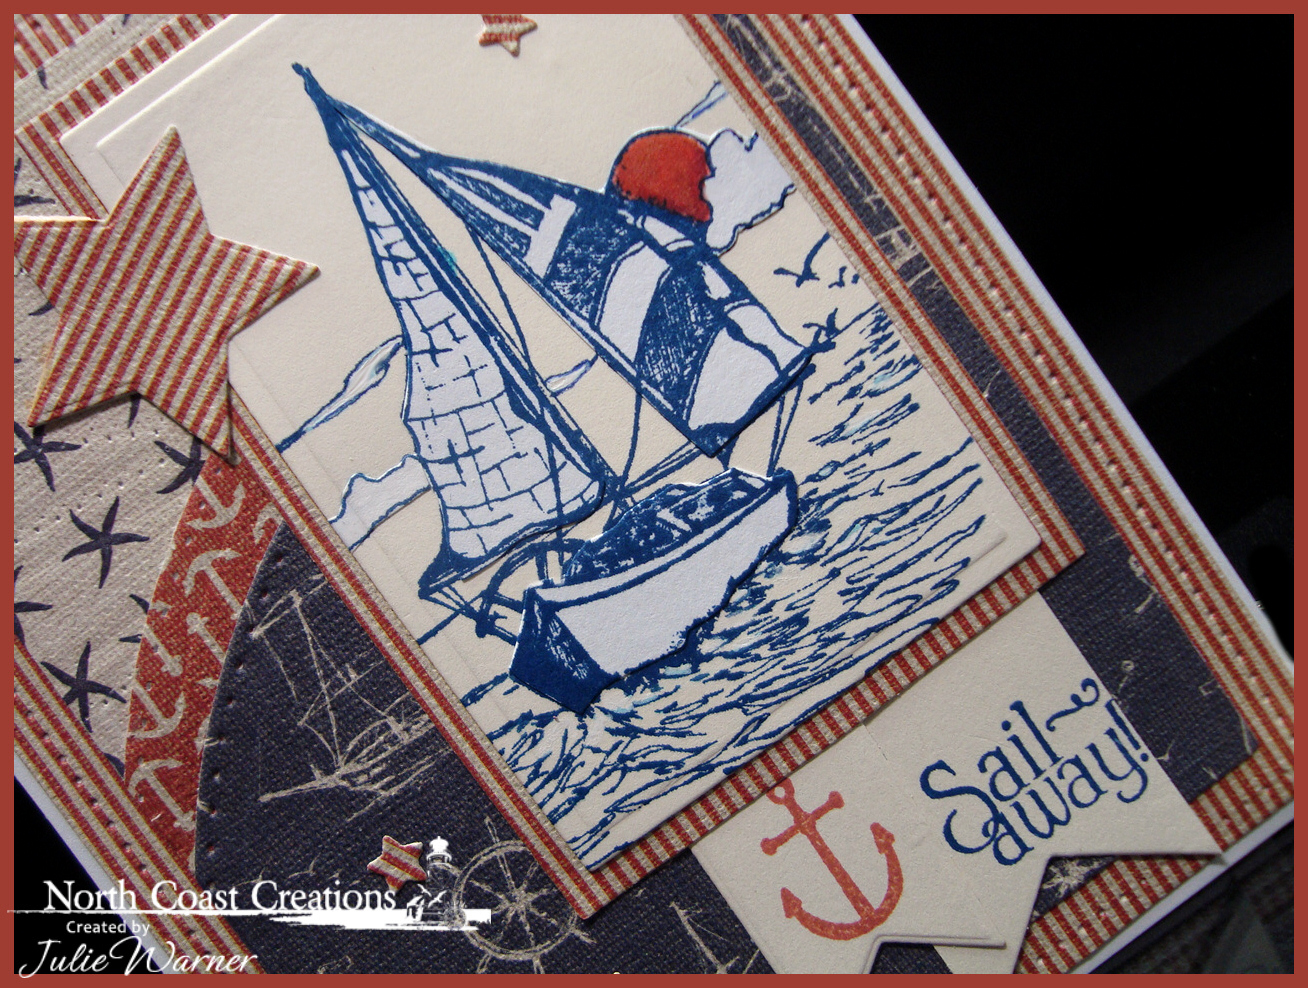 NCC Sail Away cu 06589